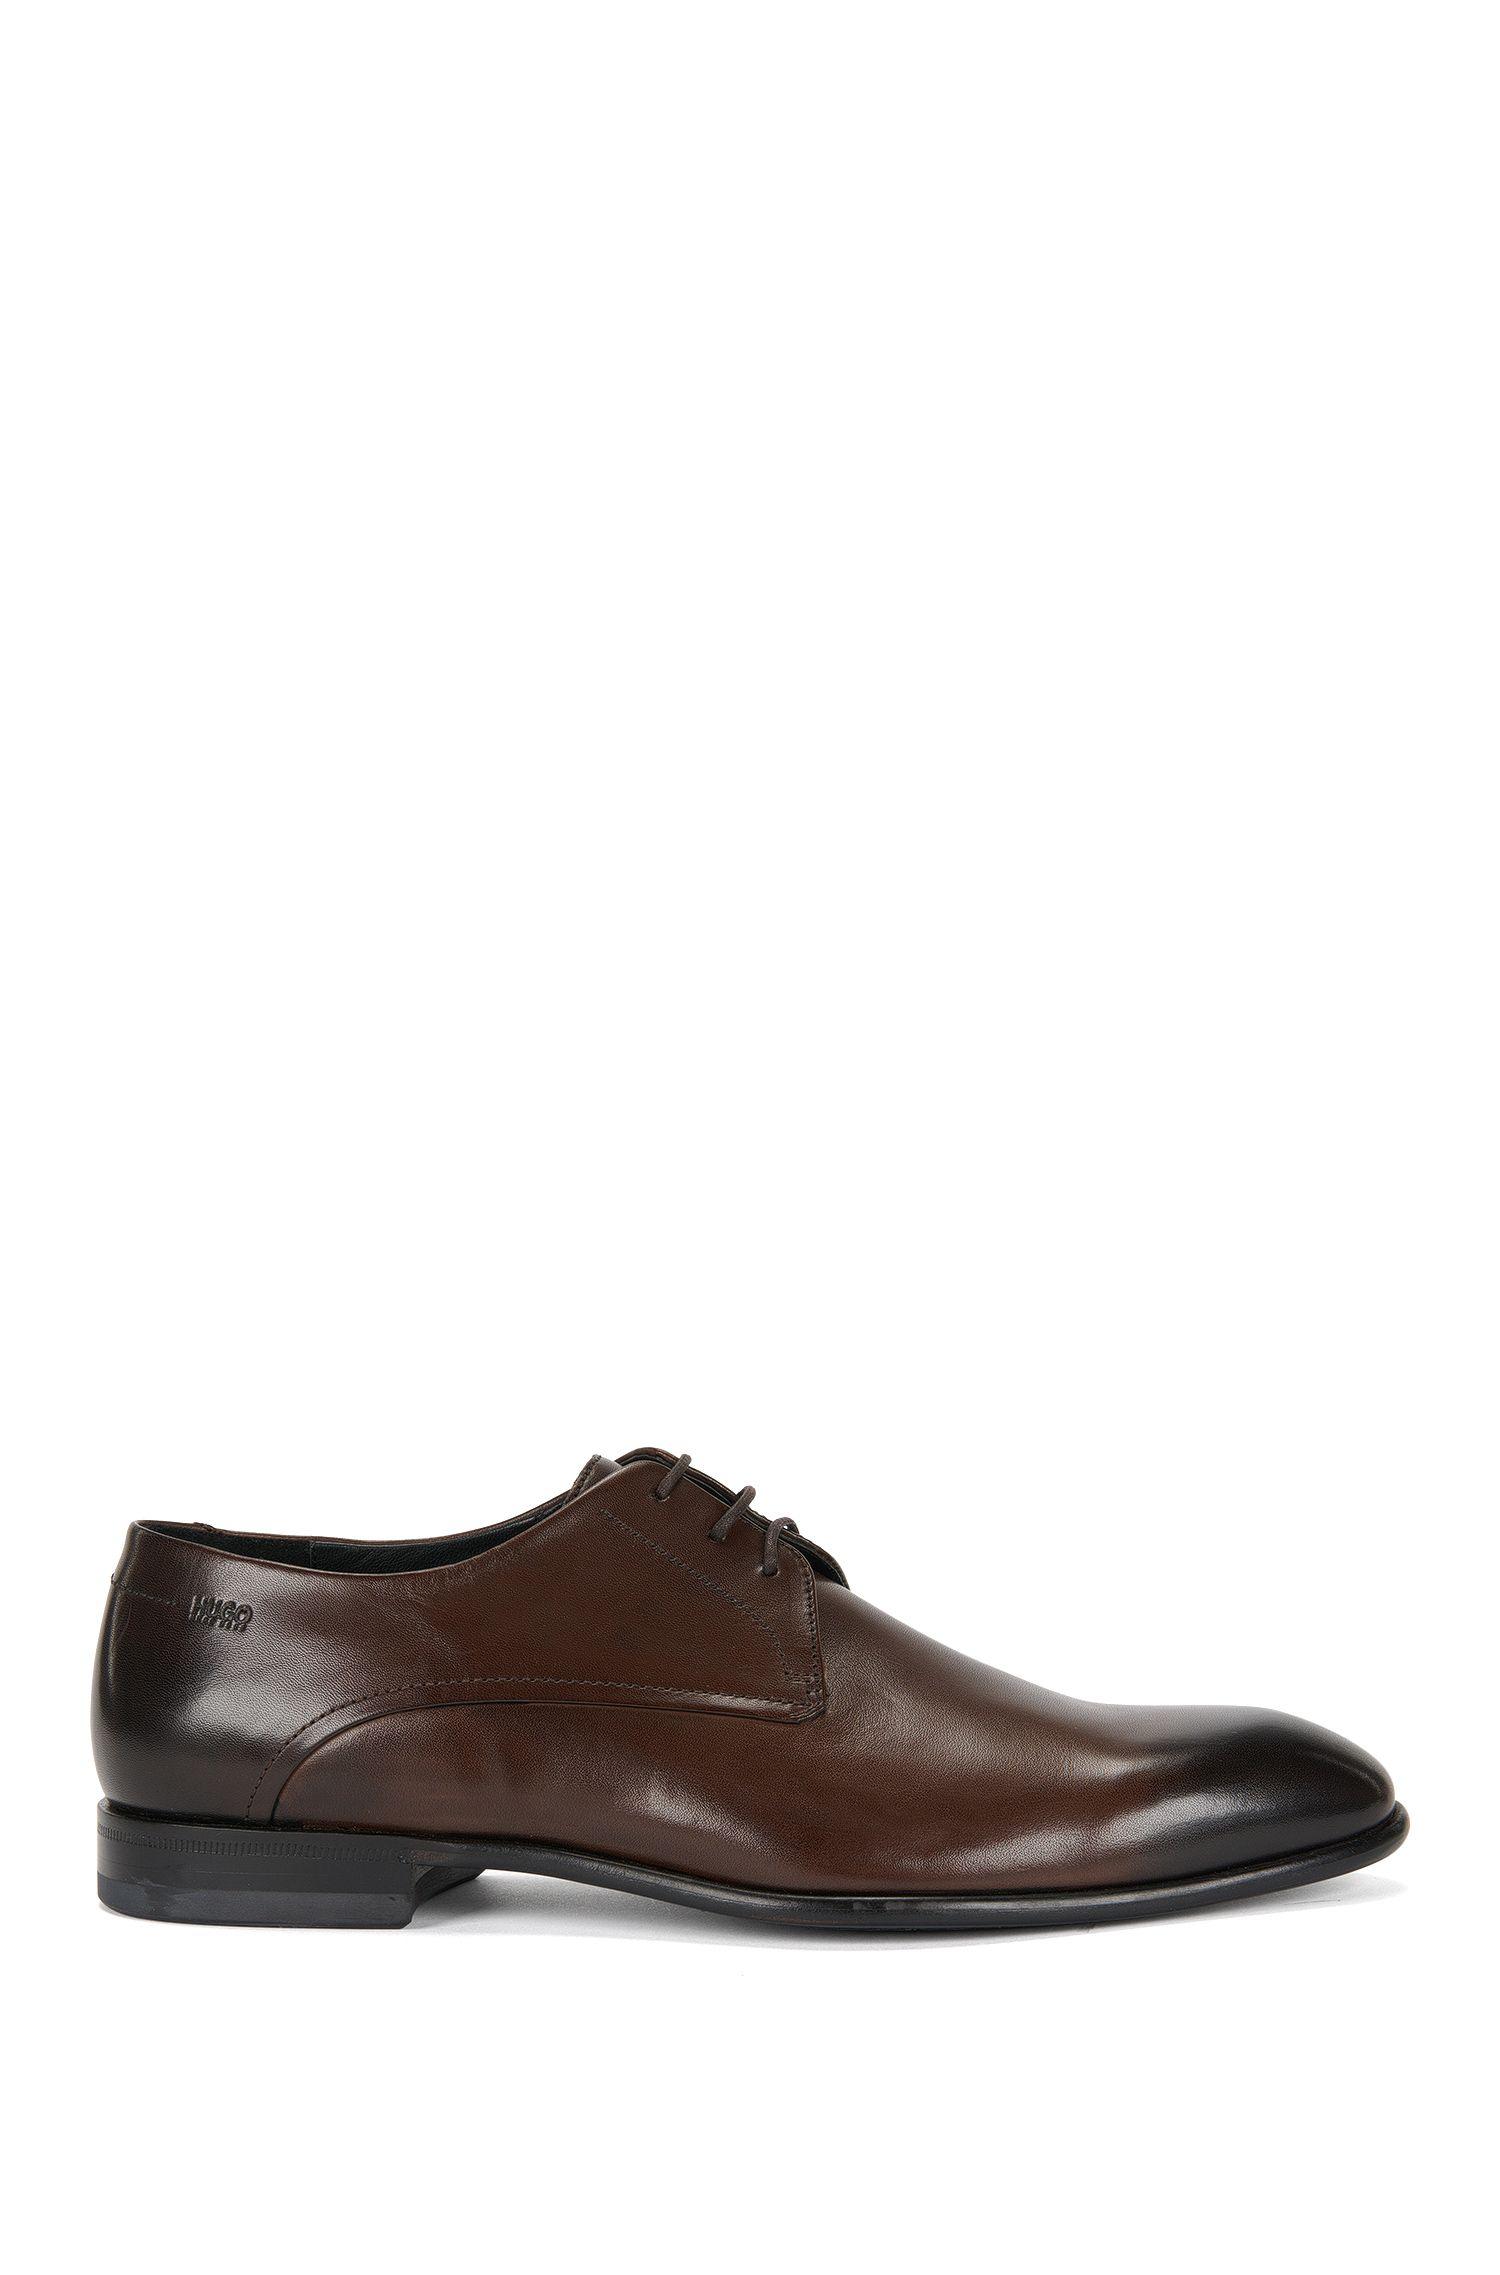 'C-Dresios' | Calfskin Derby Dress Shoes